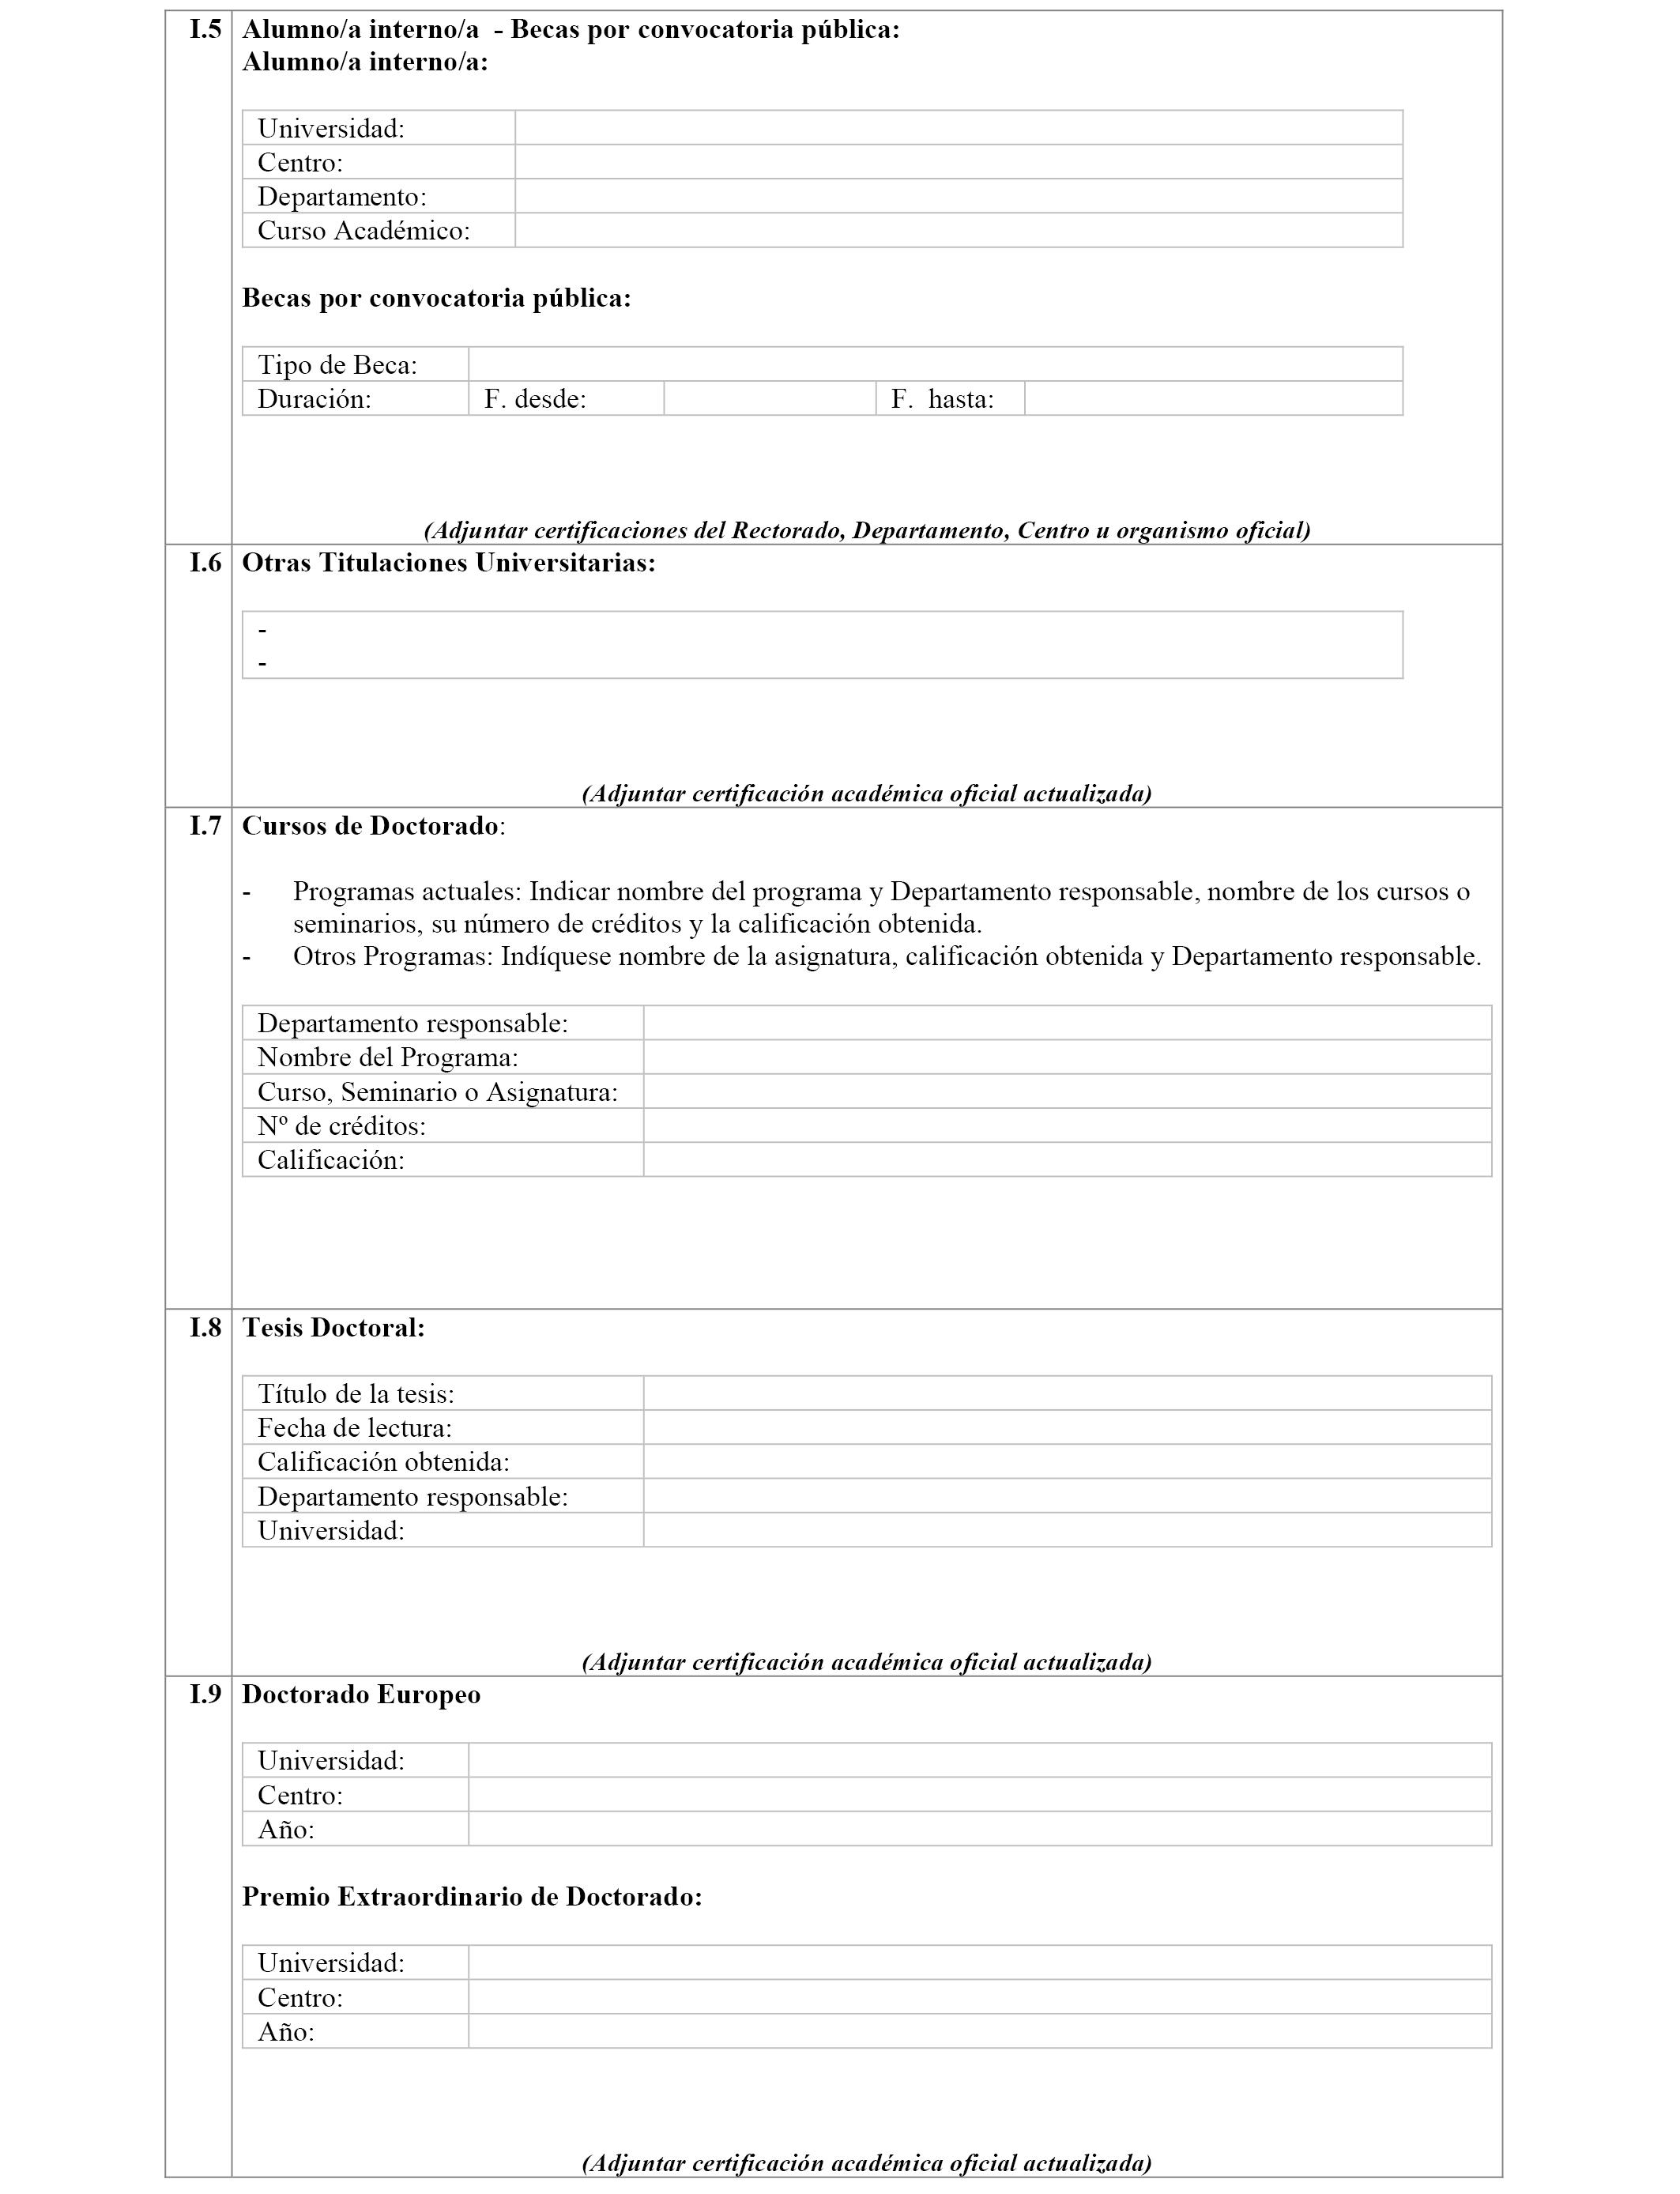 BOE.es - Documento BOE-A-2018-2947